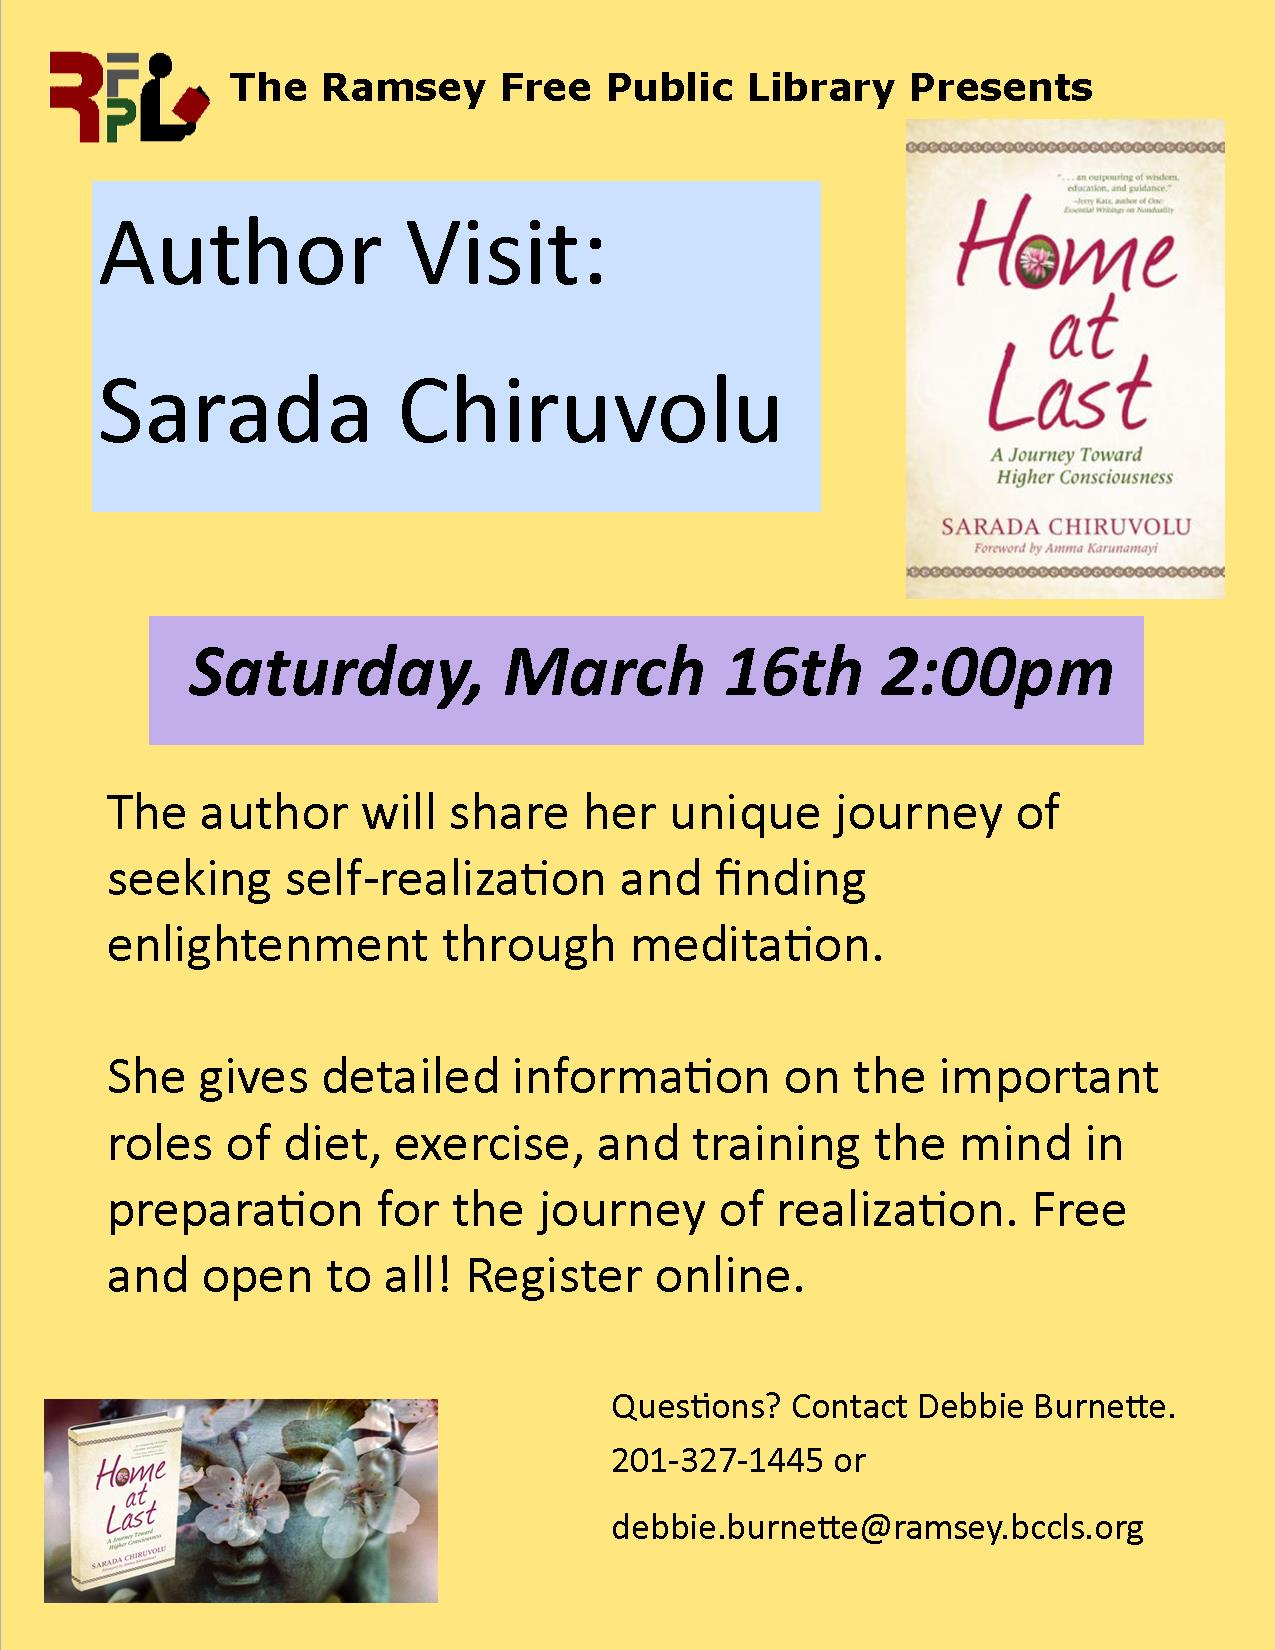 Author Visit: Sarada Chiruvolu